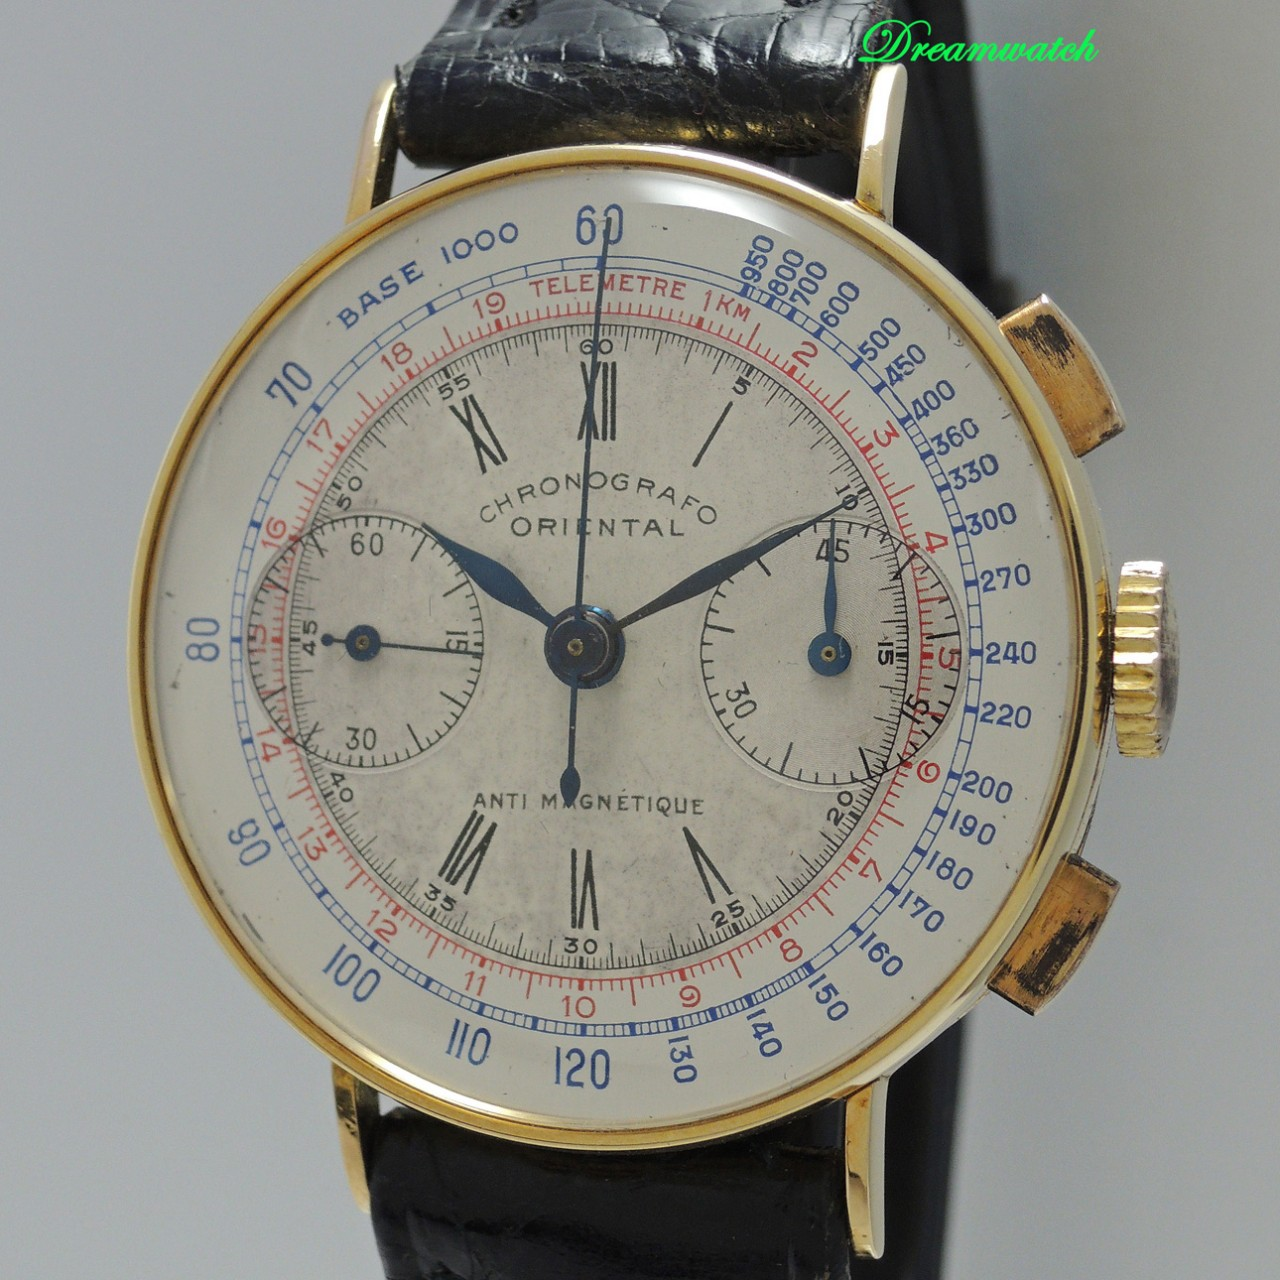 Chronografo Oriental Vintage Angelus 210 18k Gold